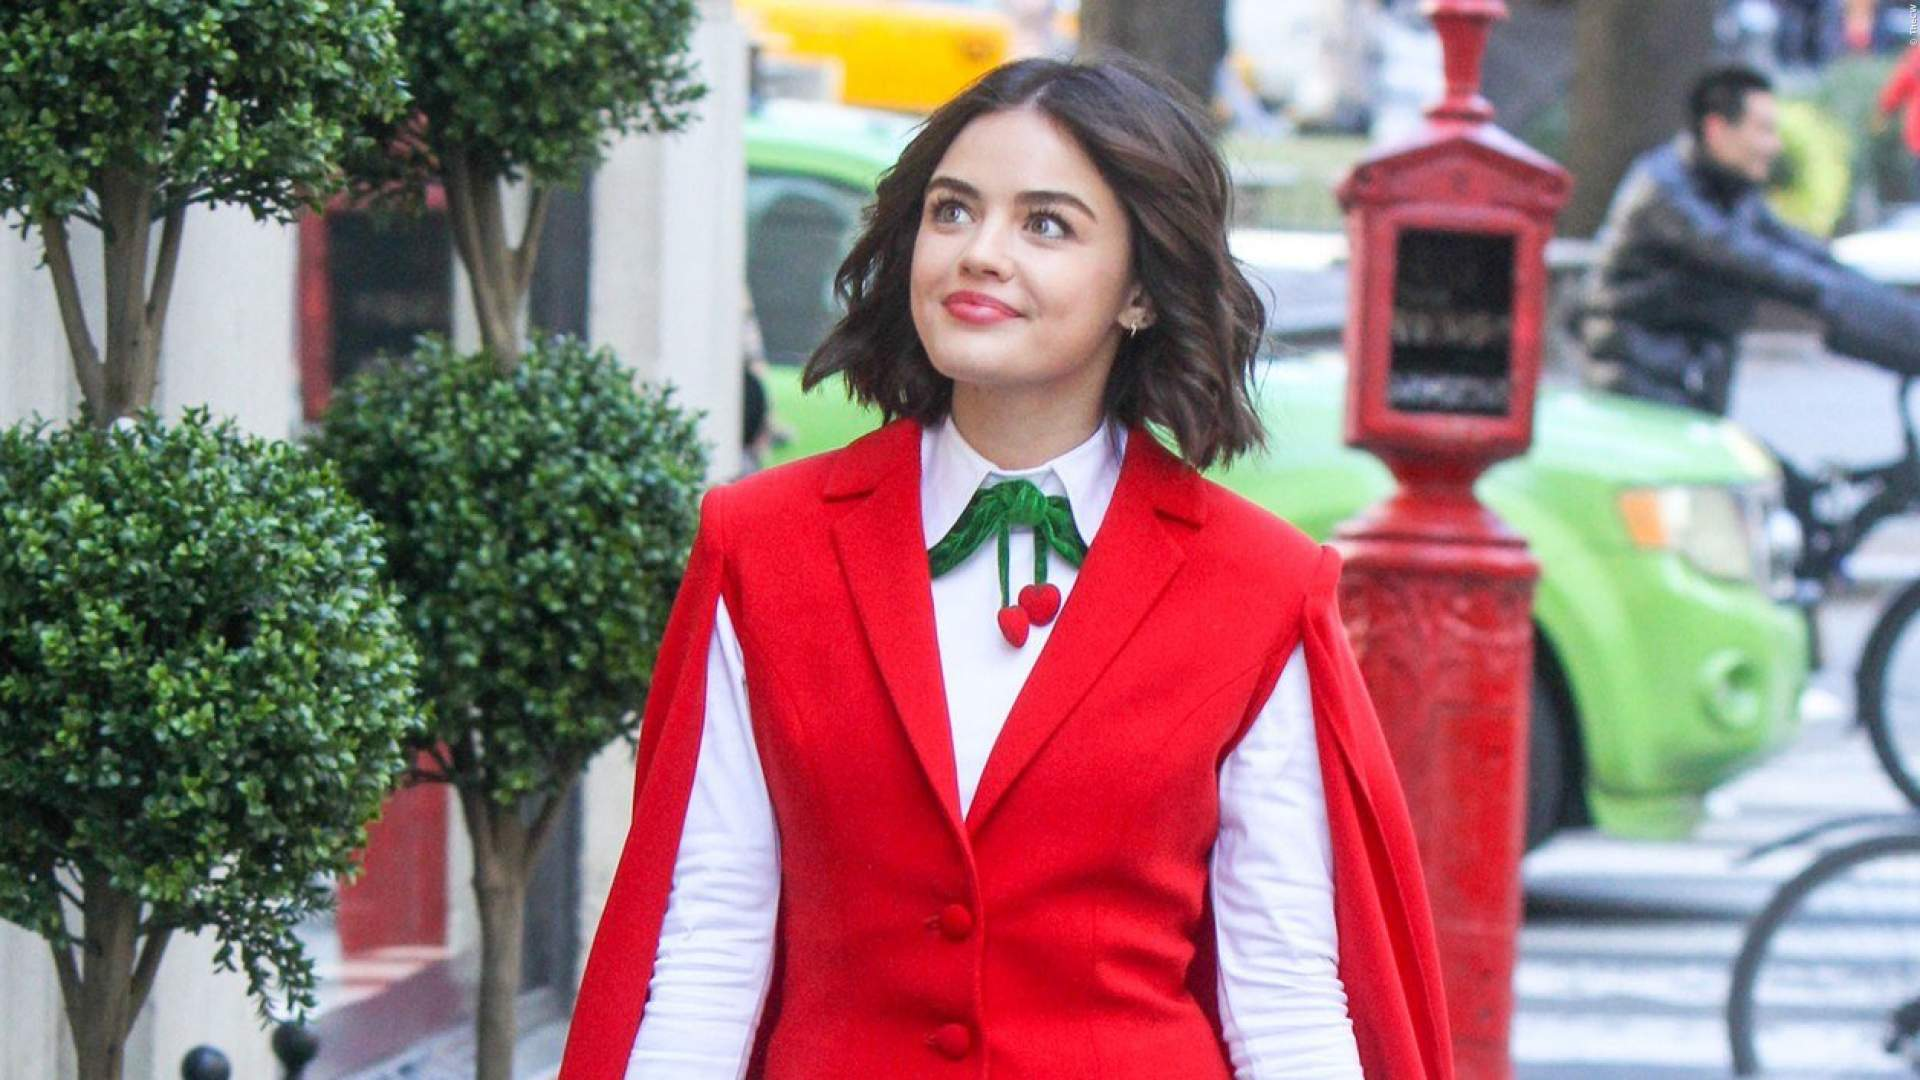 RIVERDALE: Erster langer Trailer zum Spin-Off 'Katy Keene'